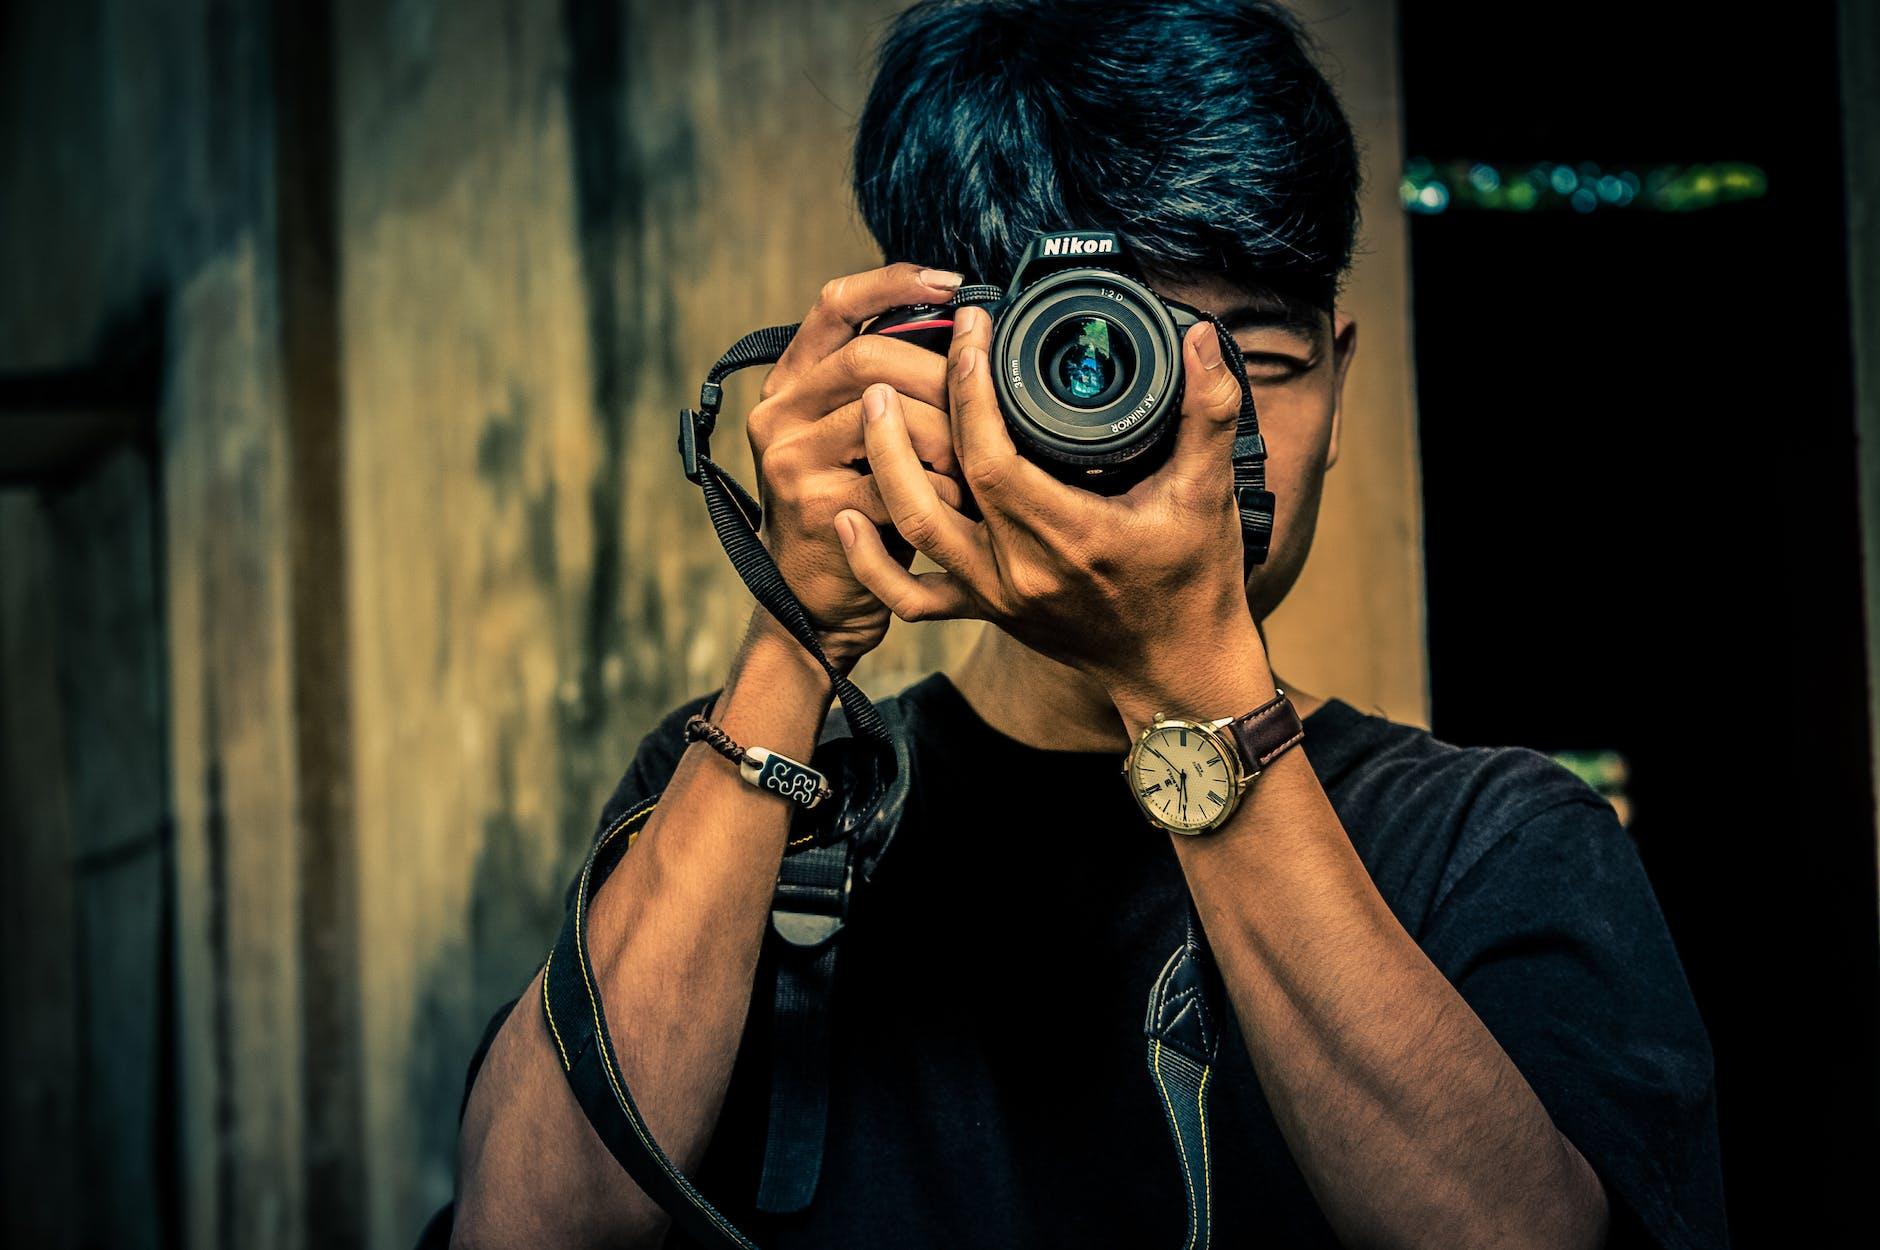 Man holding a nikon d5600 camera and capturing photo